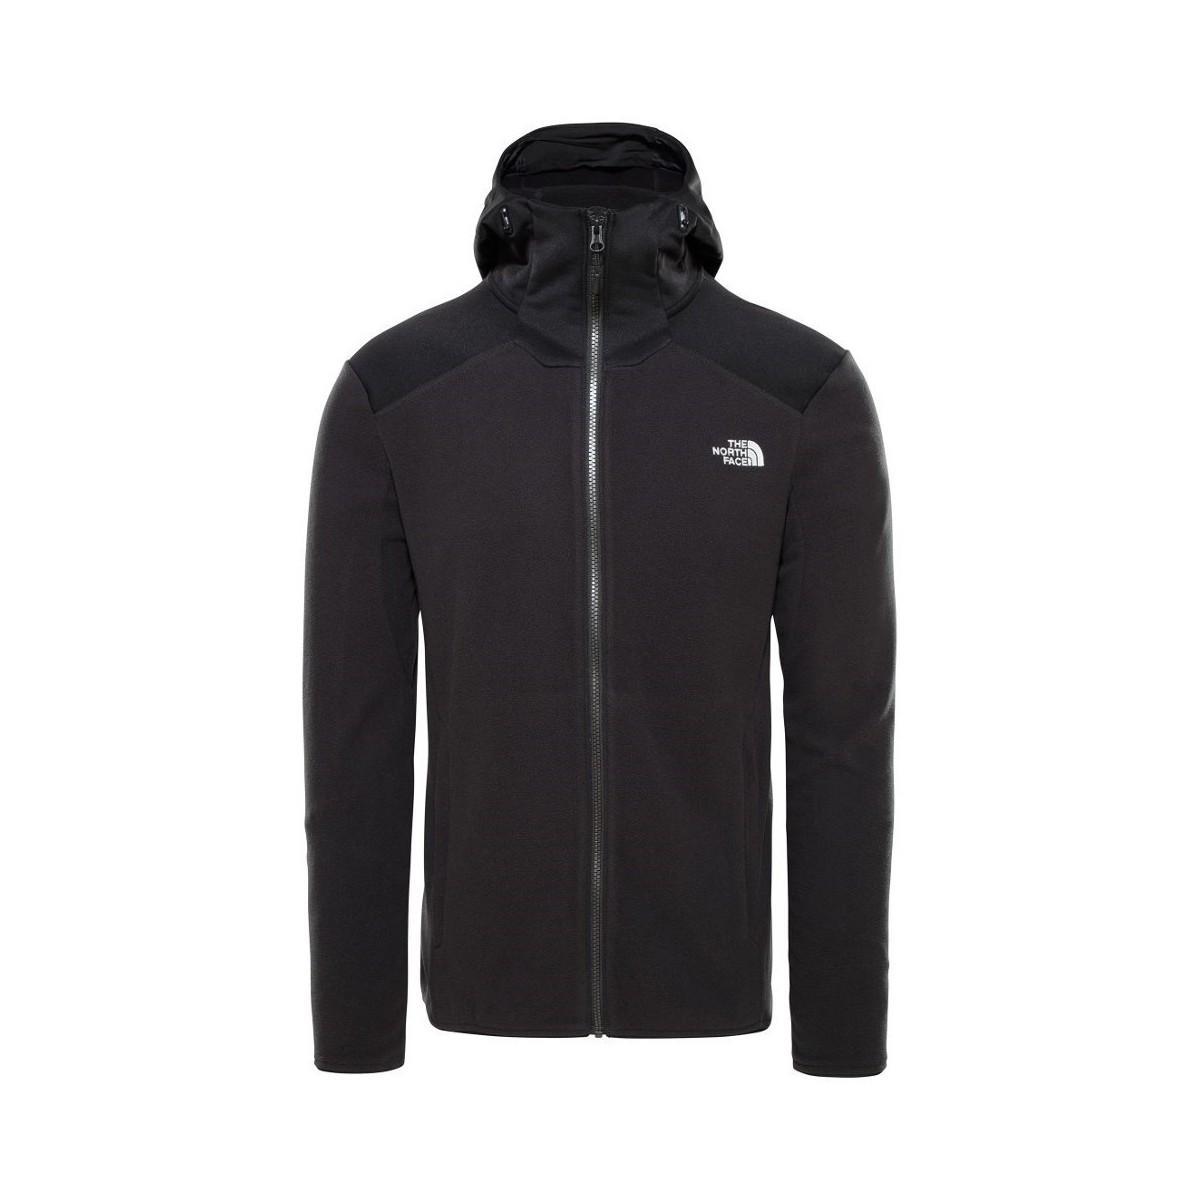 de4bbd8d9 The North Face Purna Ii Hoodie Men's Sweatshirt In Black in Black ...